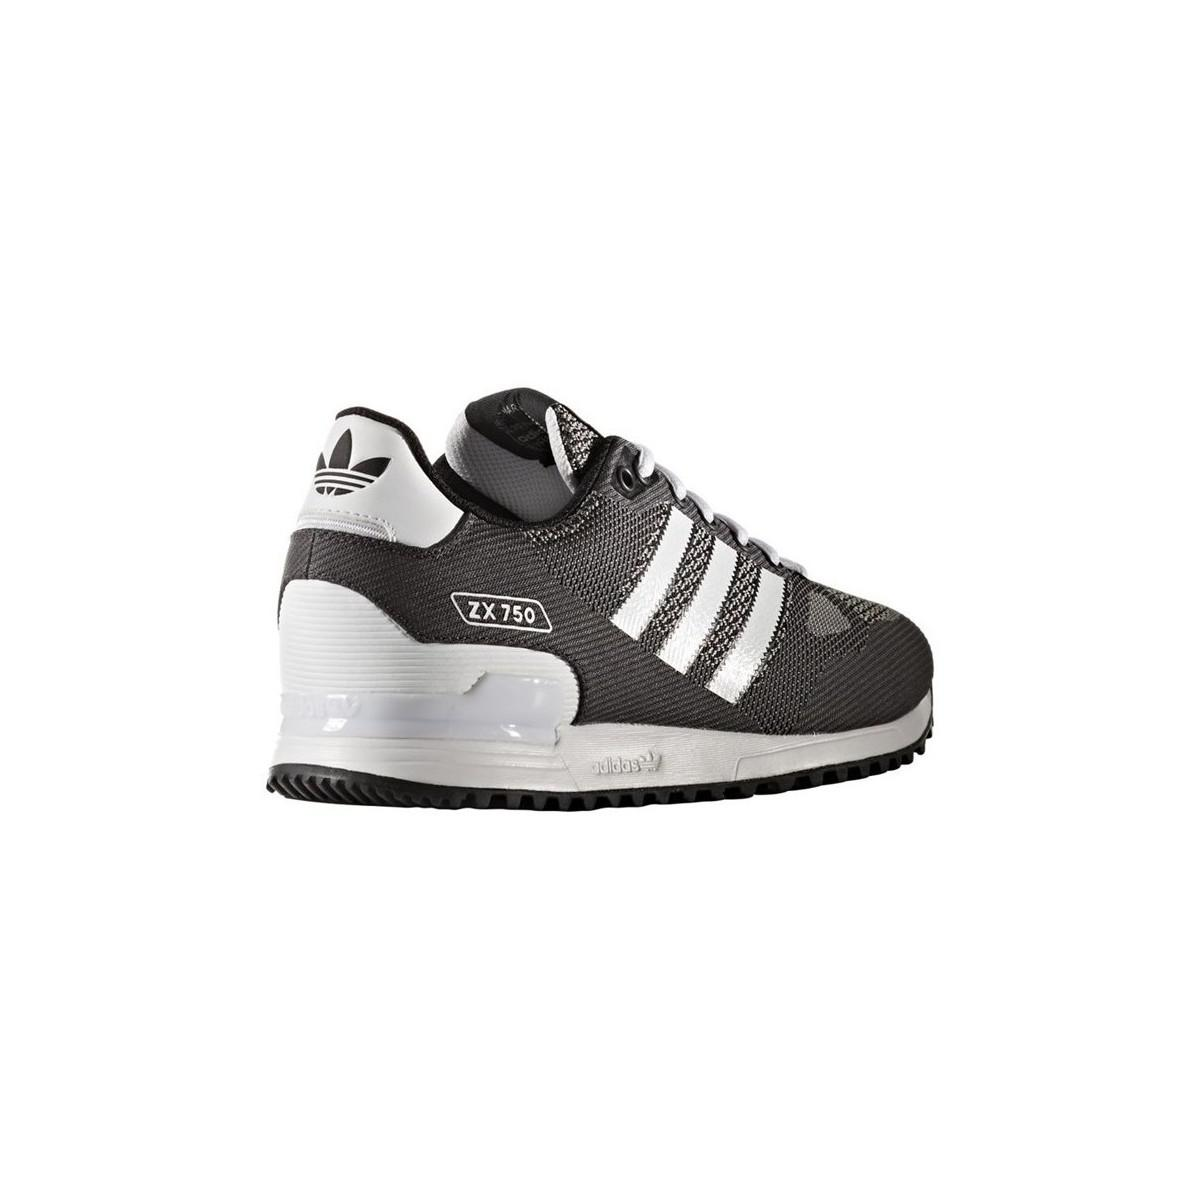 adidas zx 750 wv uomo